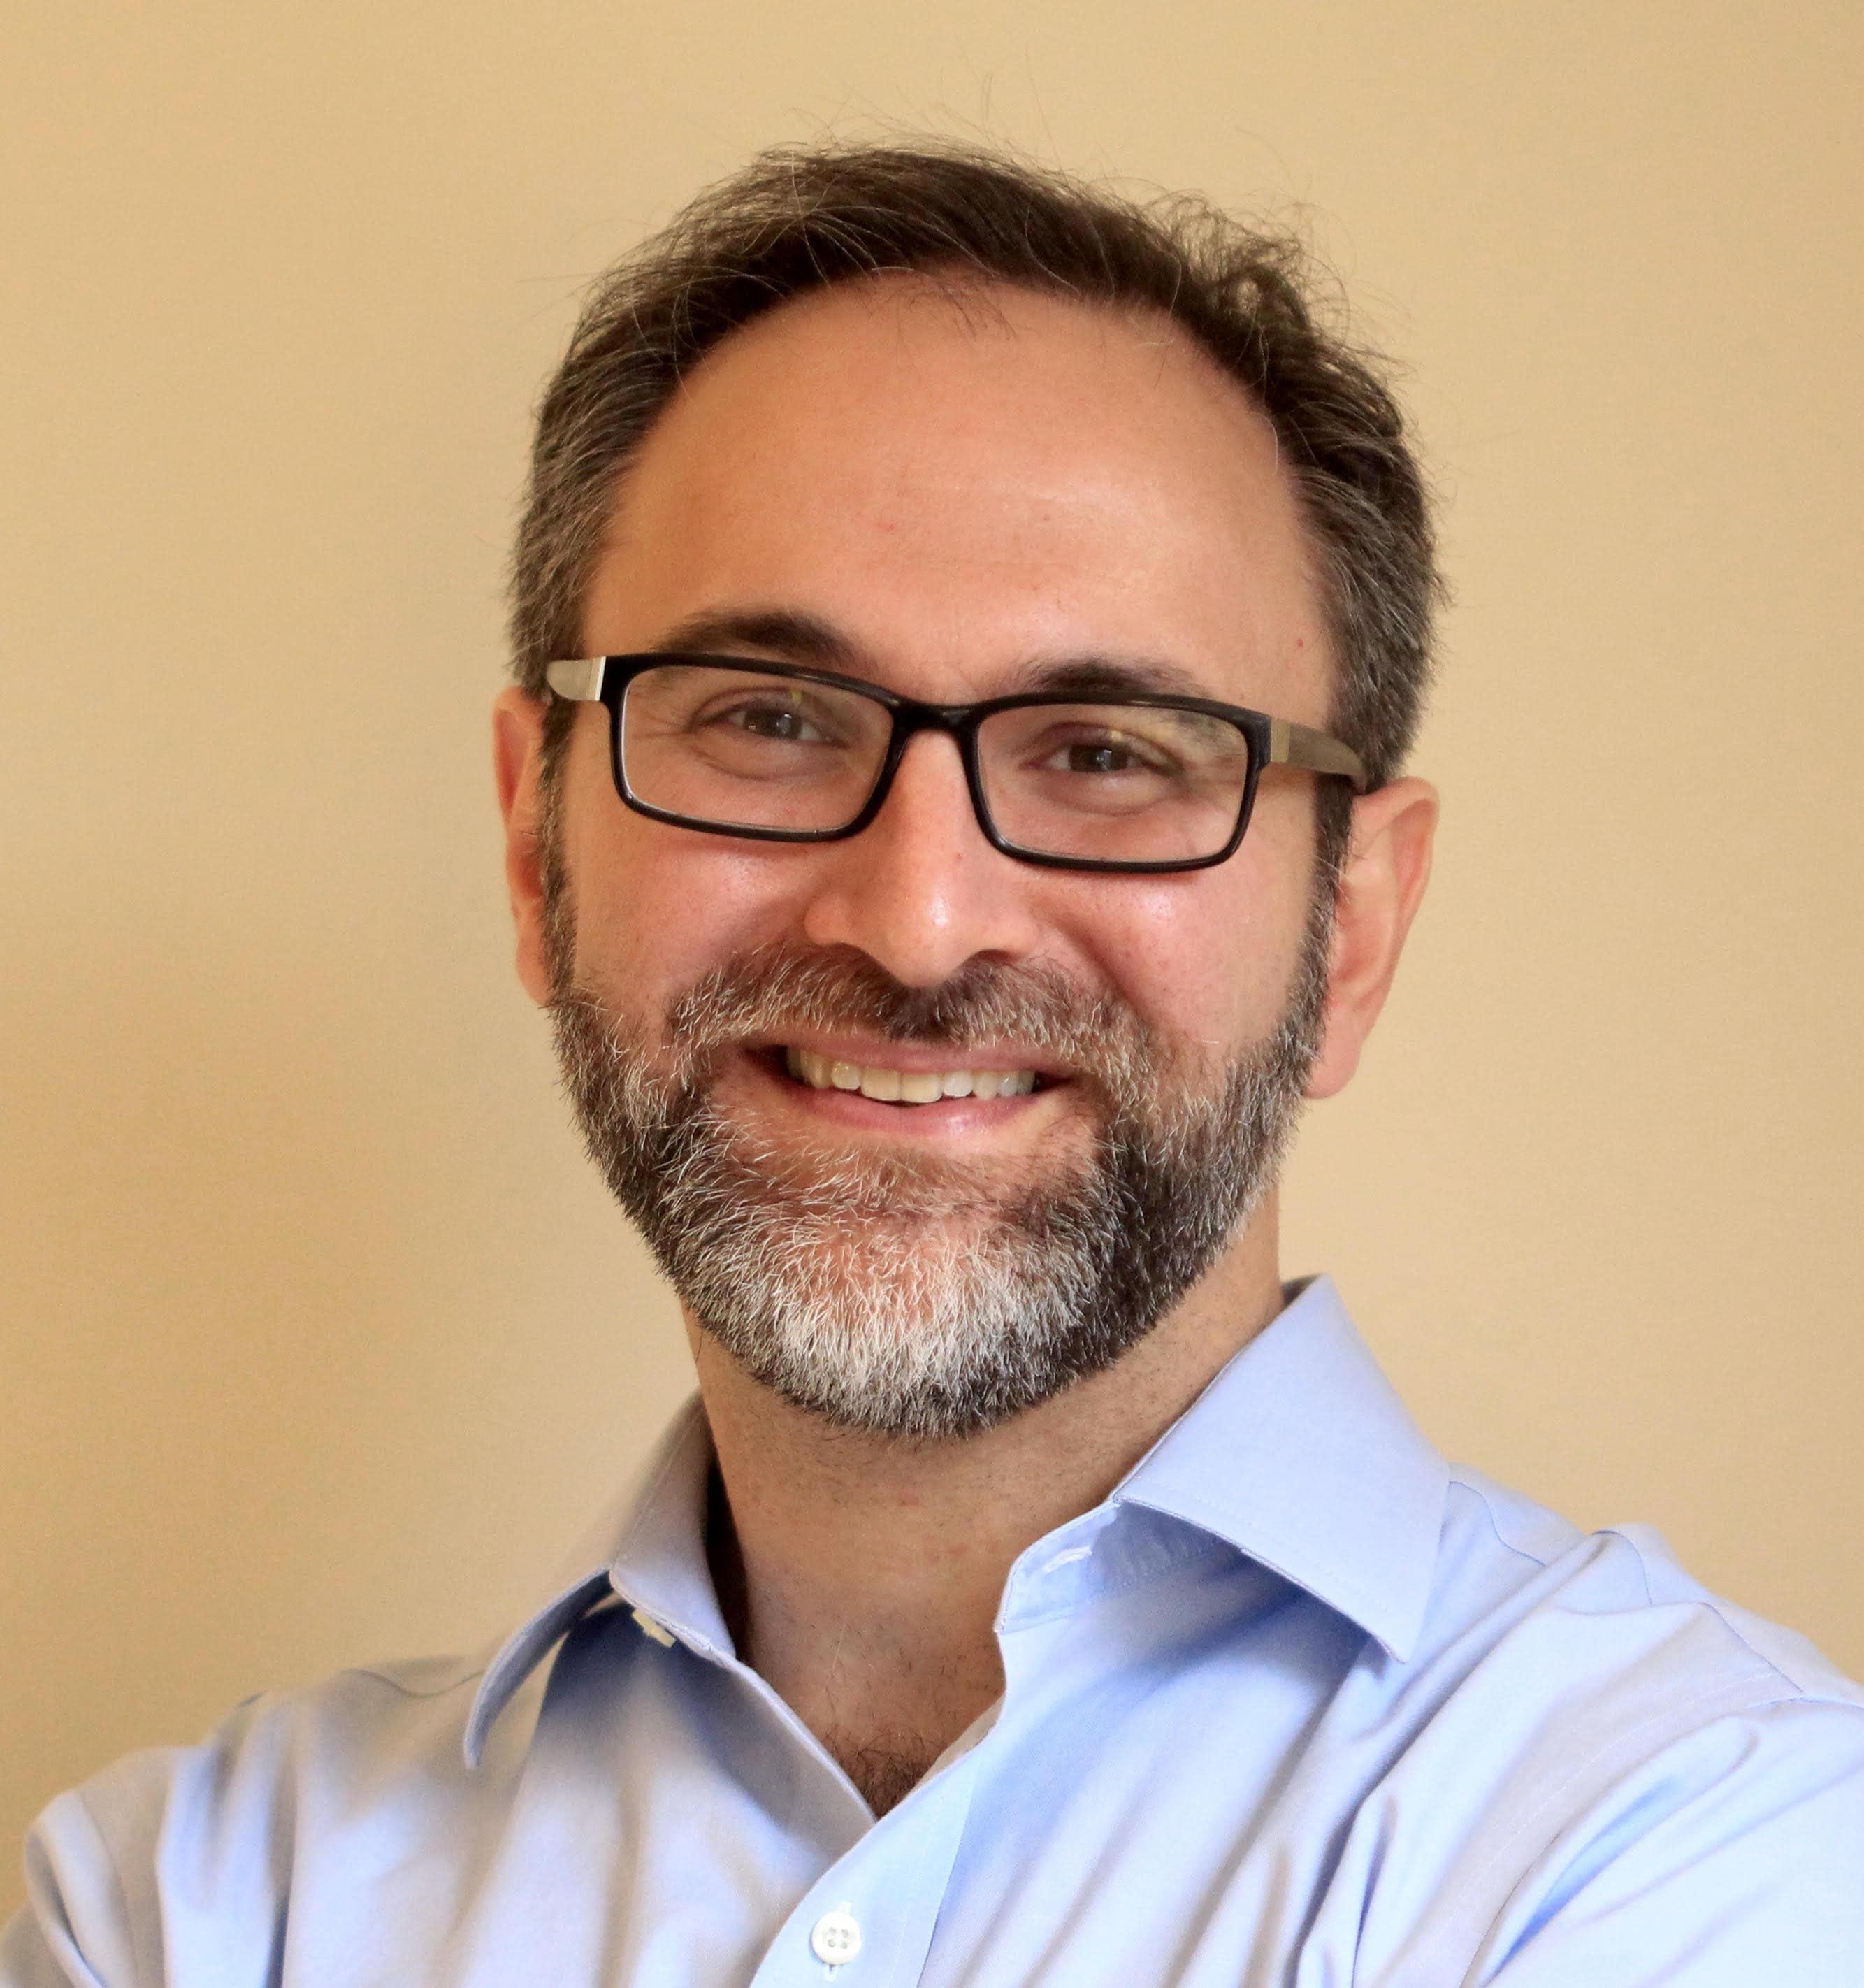 Dr. Ben L Bregman MD